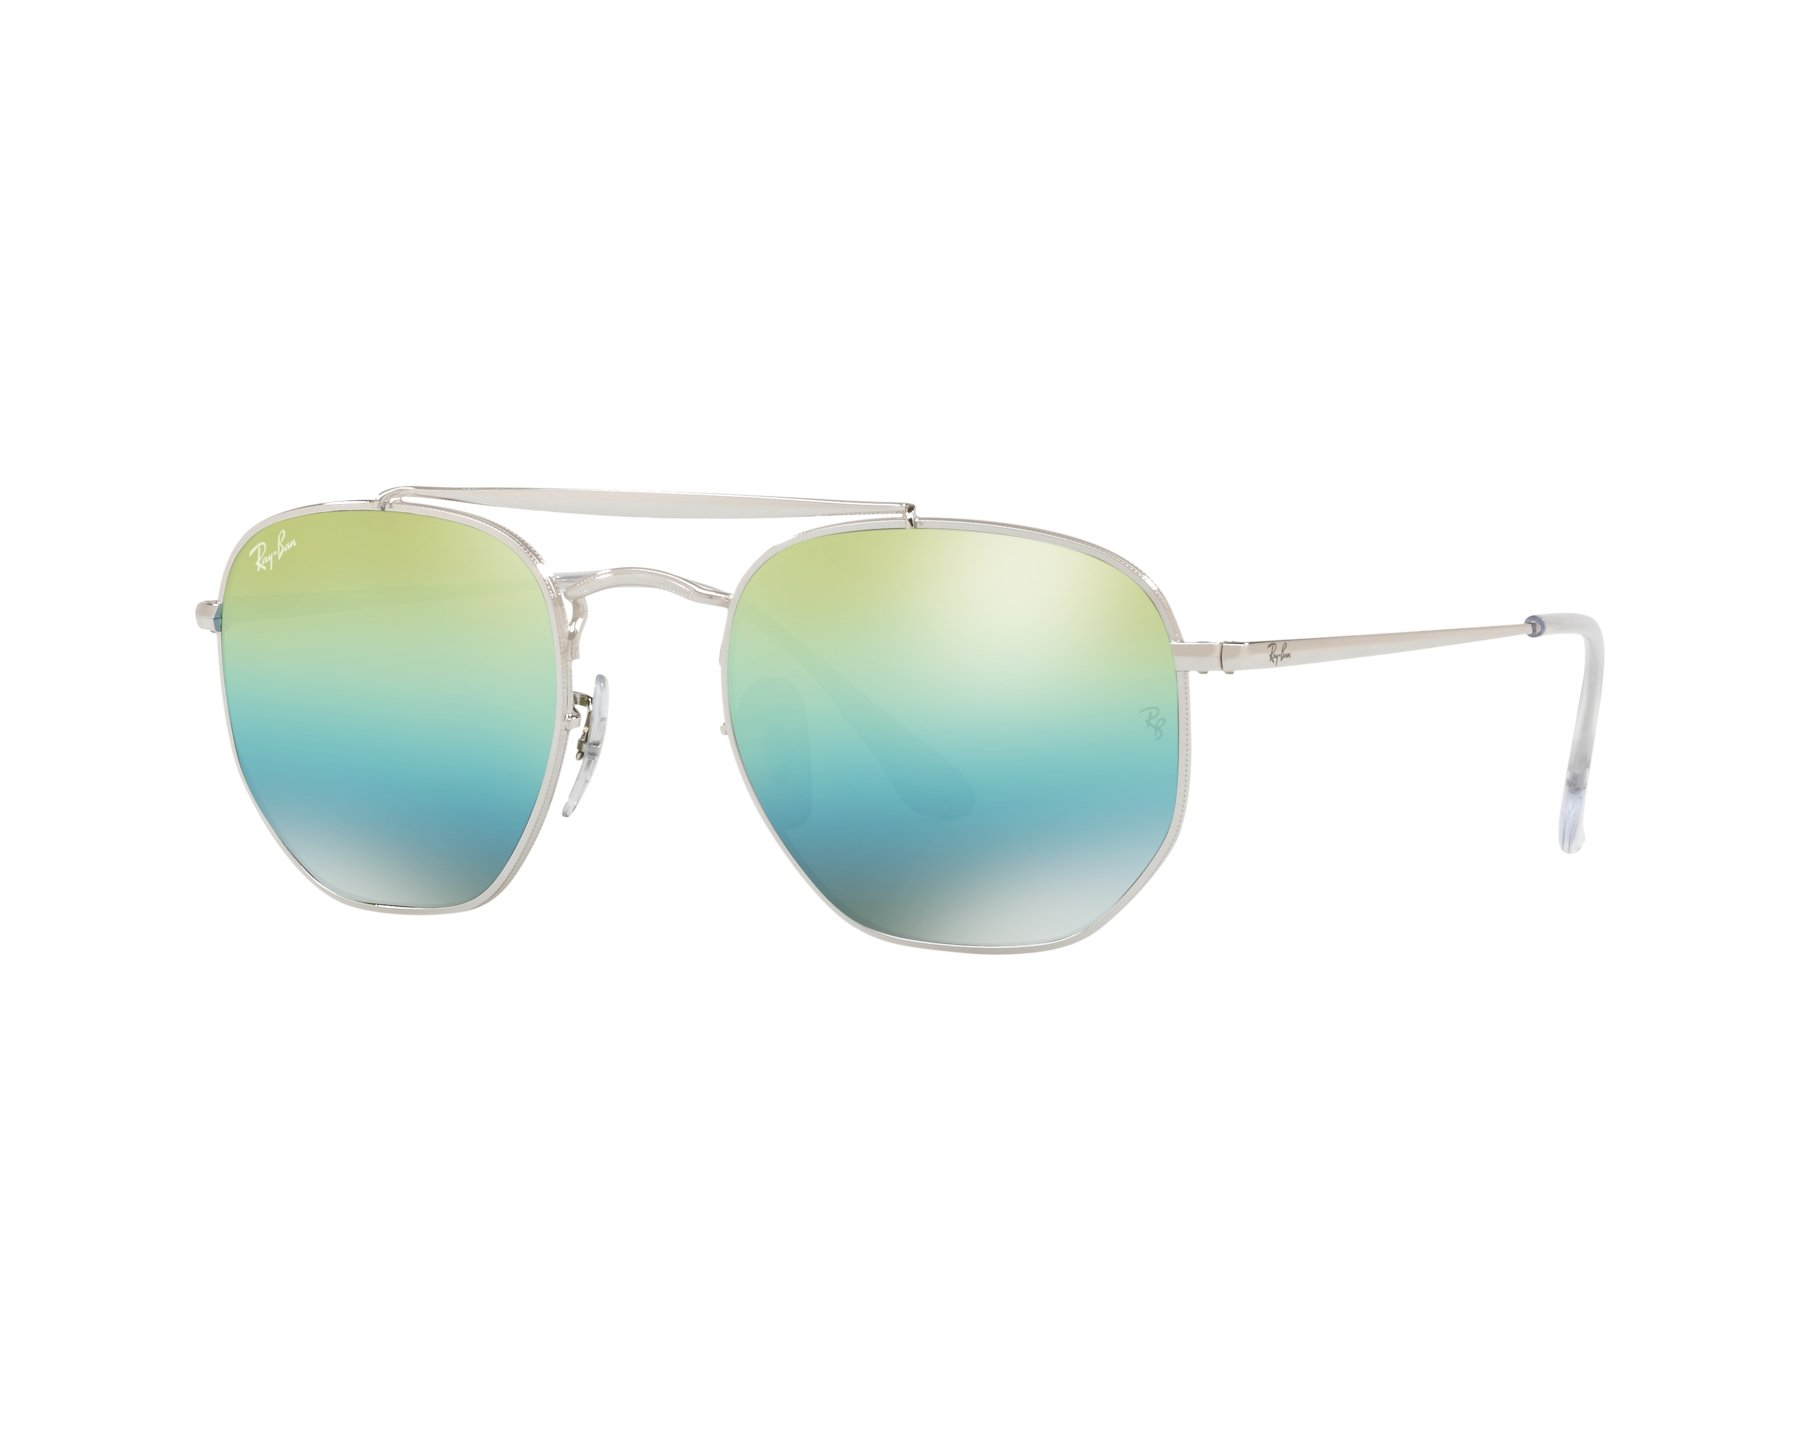 cd6bd757b2b9e5 Sunglasses Ray-Ban RB-3648 003 l2 54-21 Silver